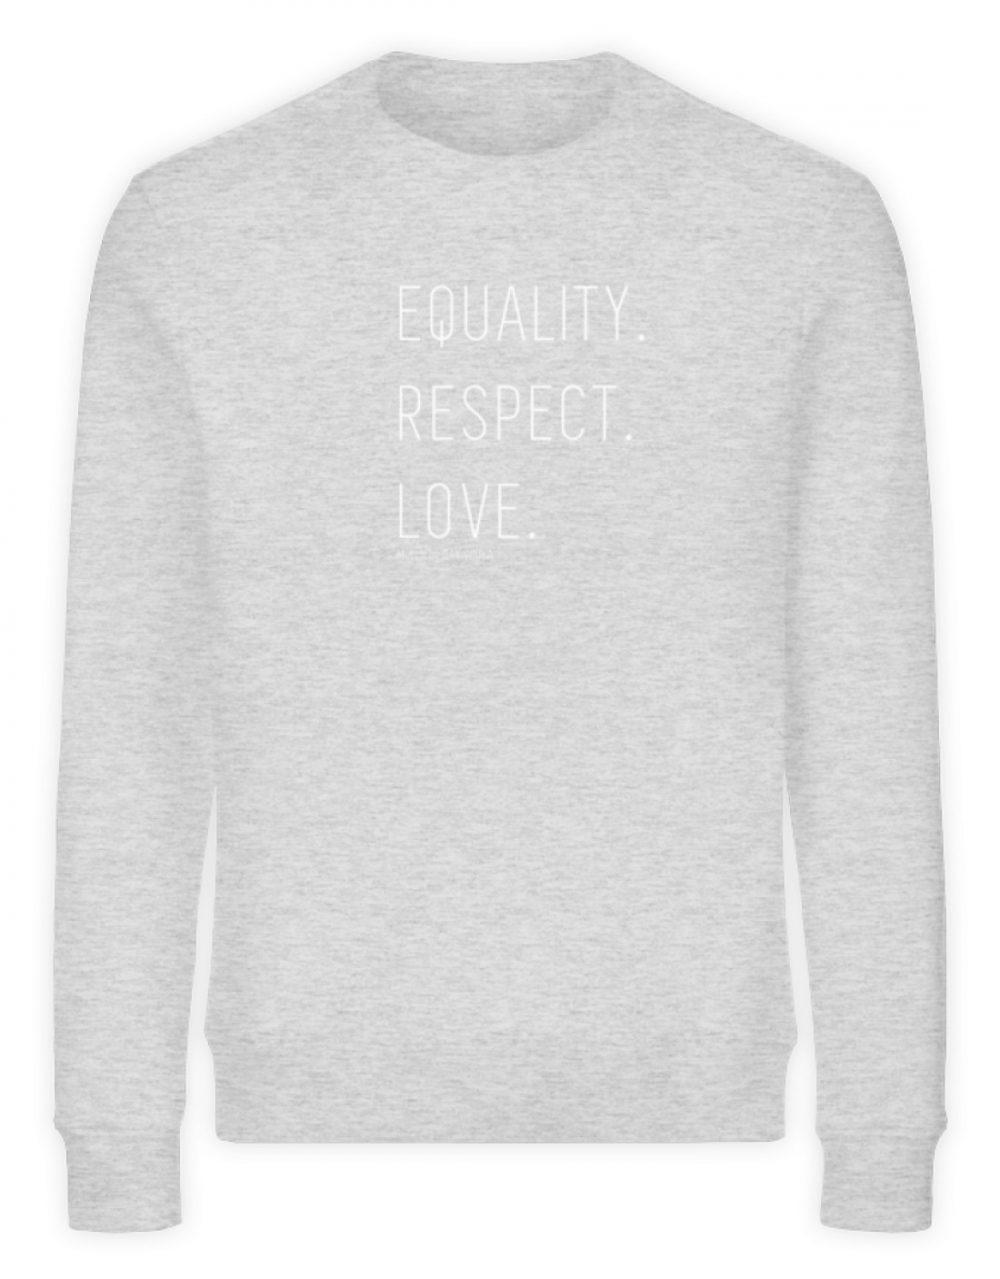 EQUALITY. RESPECT. LOVE. - Unisex Organic Sweatshirt-6892